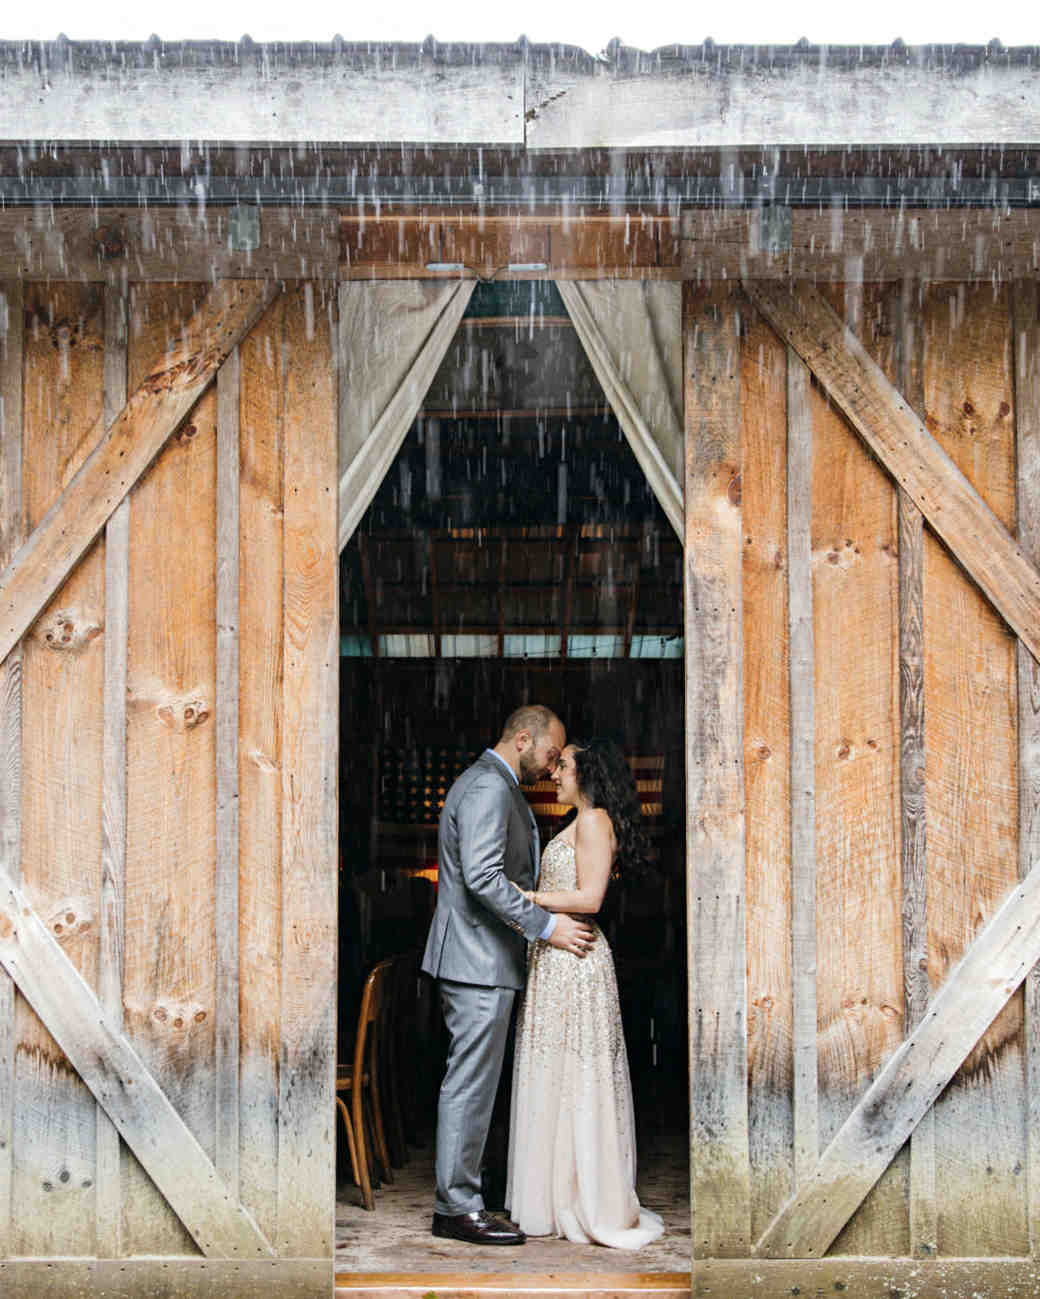 rainy wedding couple in barn